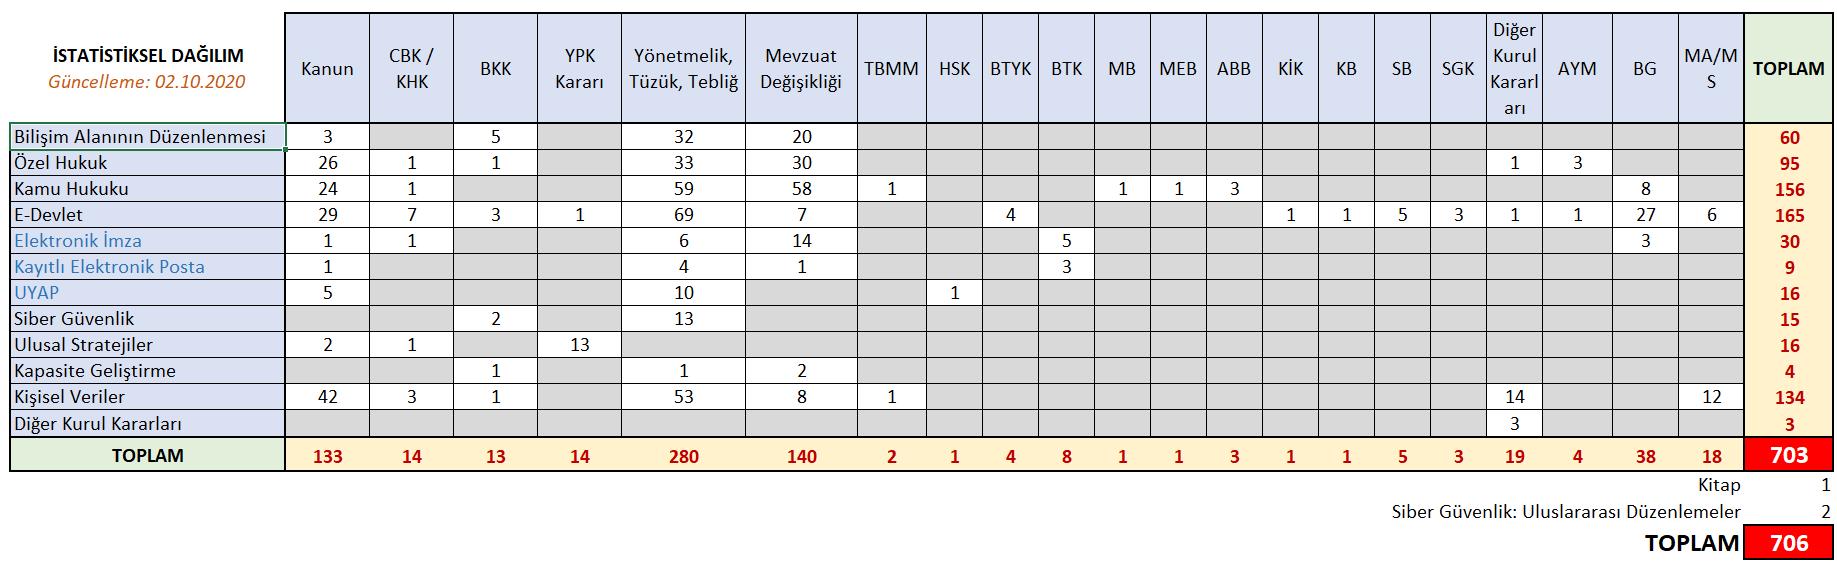 20201002-Mevzuat_istatistik